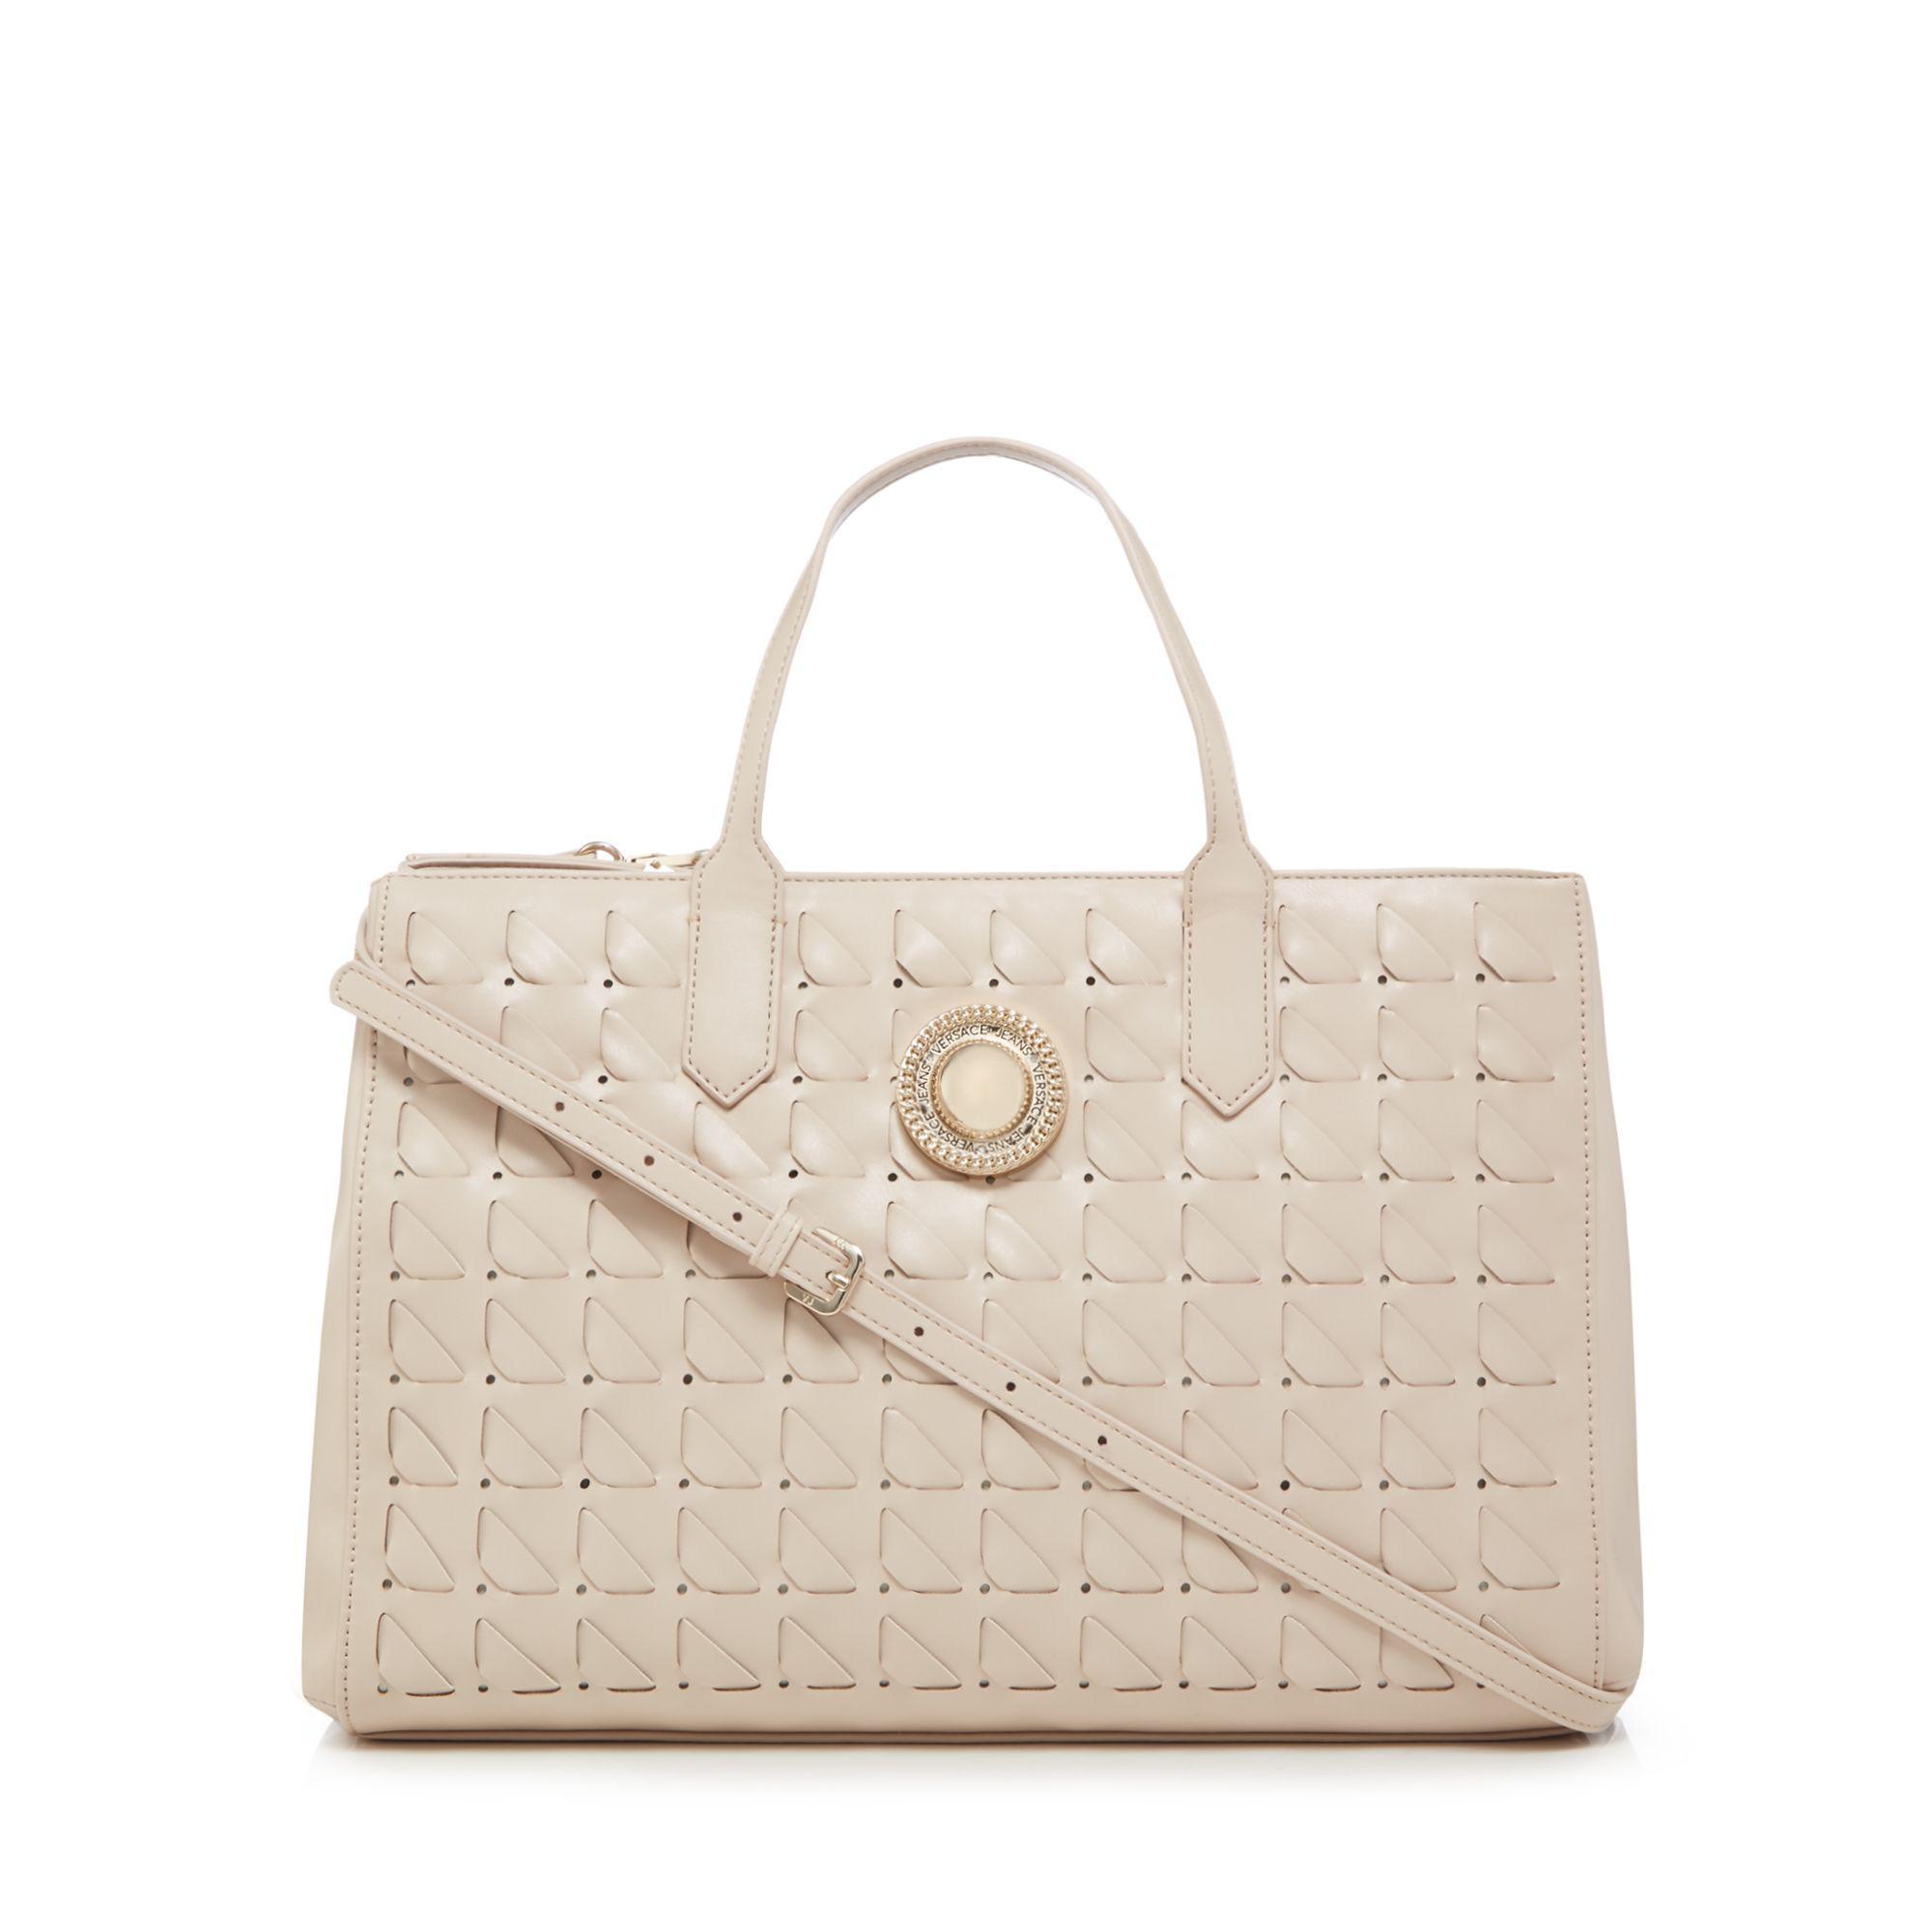 Versace Jeans Cream Interlace Shoulder Bag in Natural - Lyst c47146d13f90b